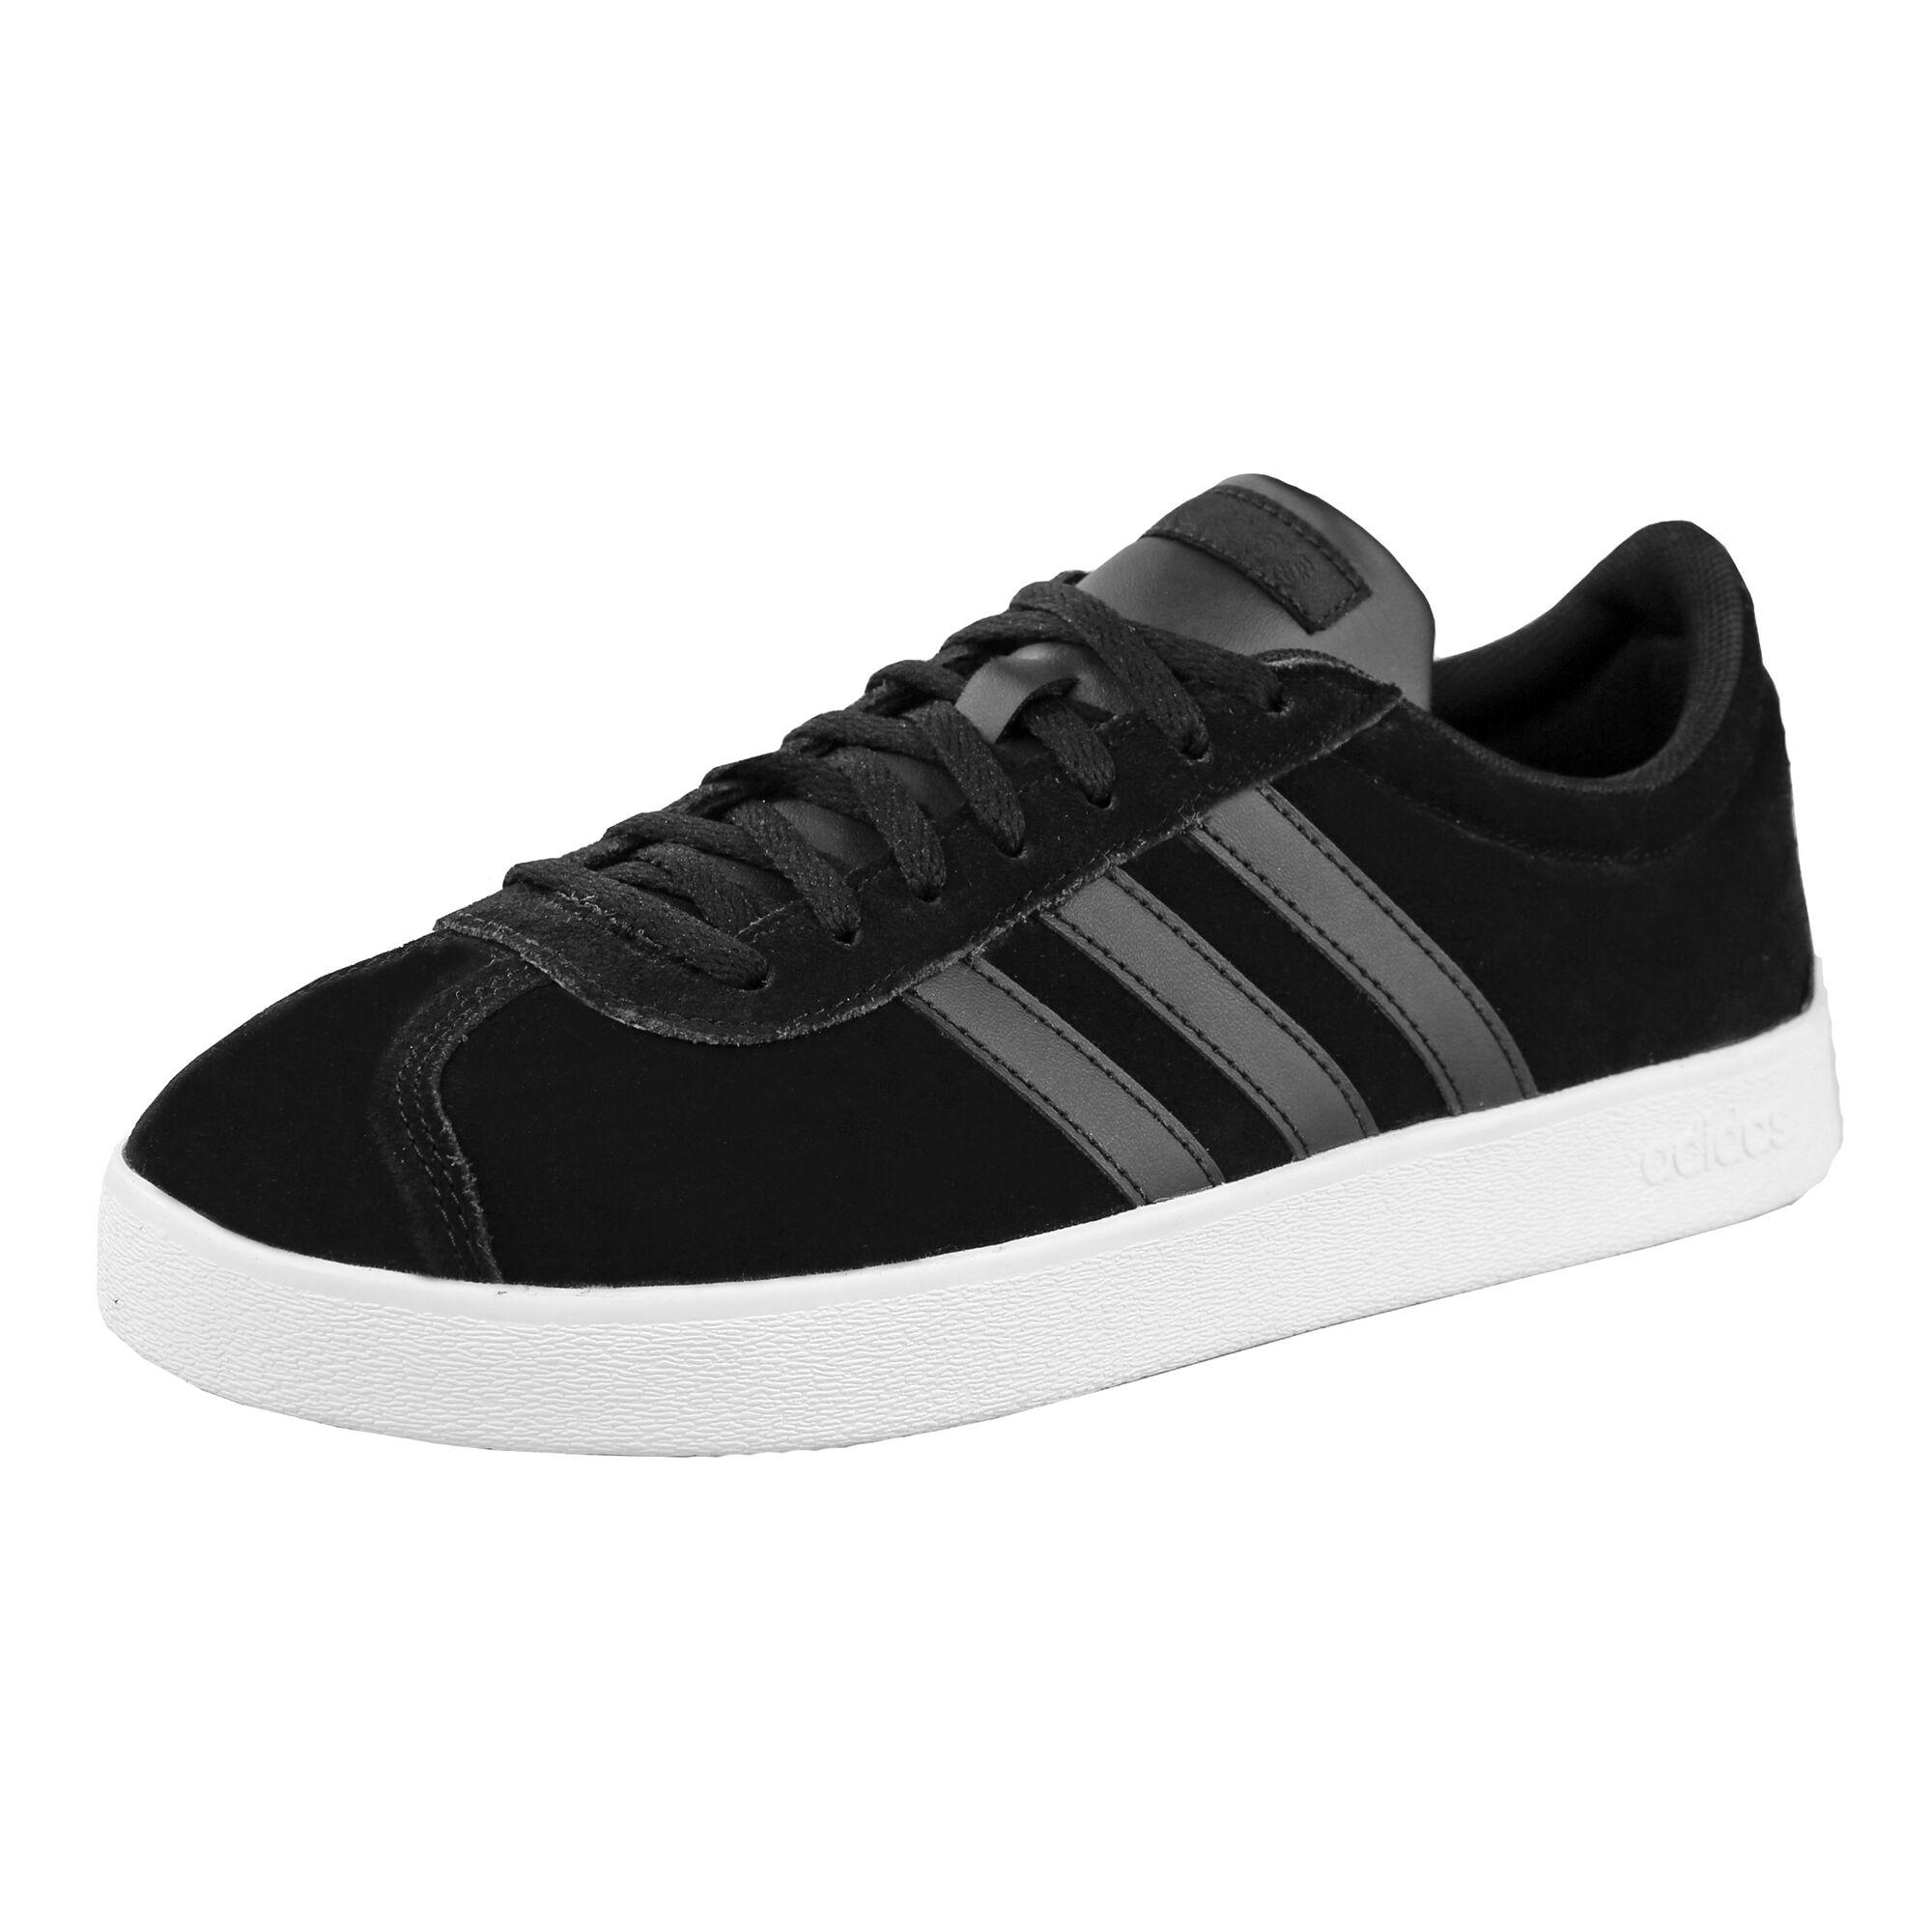 best service 6934a 2d8eb adidas · adidas · adidas · adidas · adidas. NEO VL Court ...